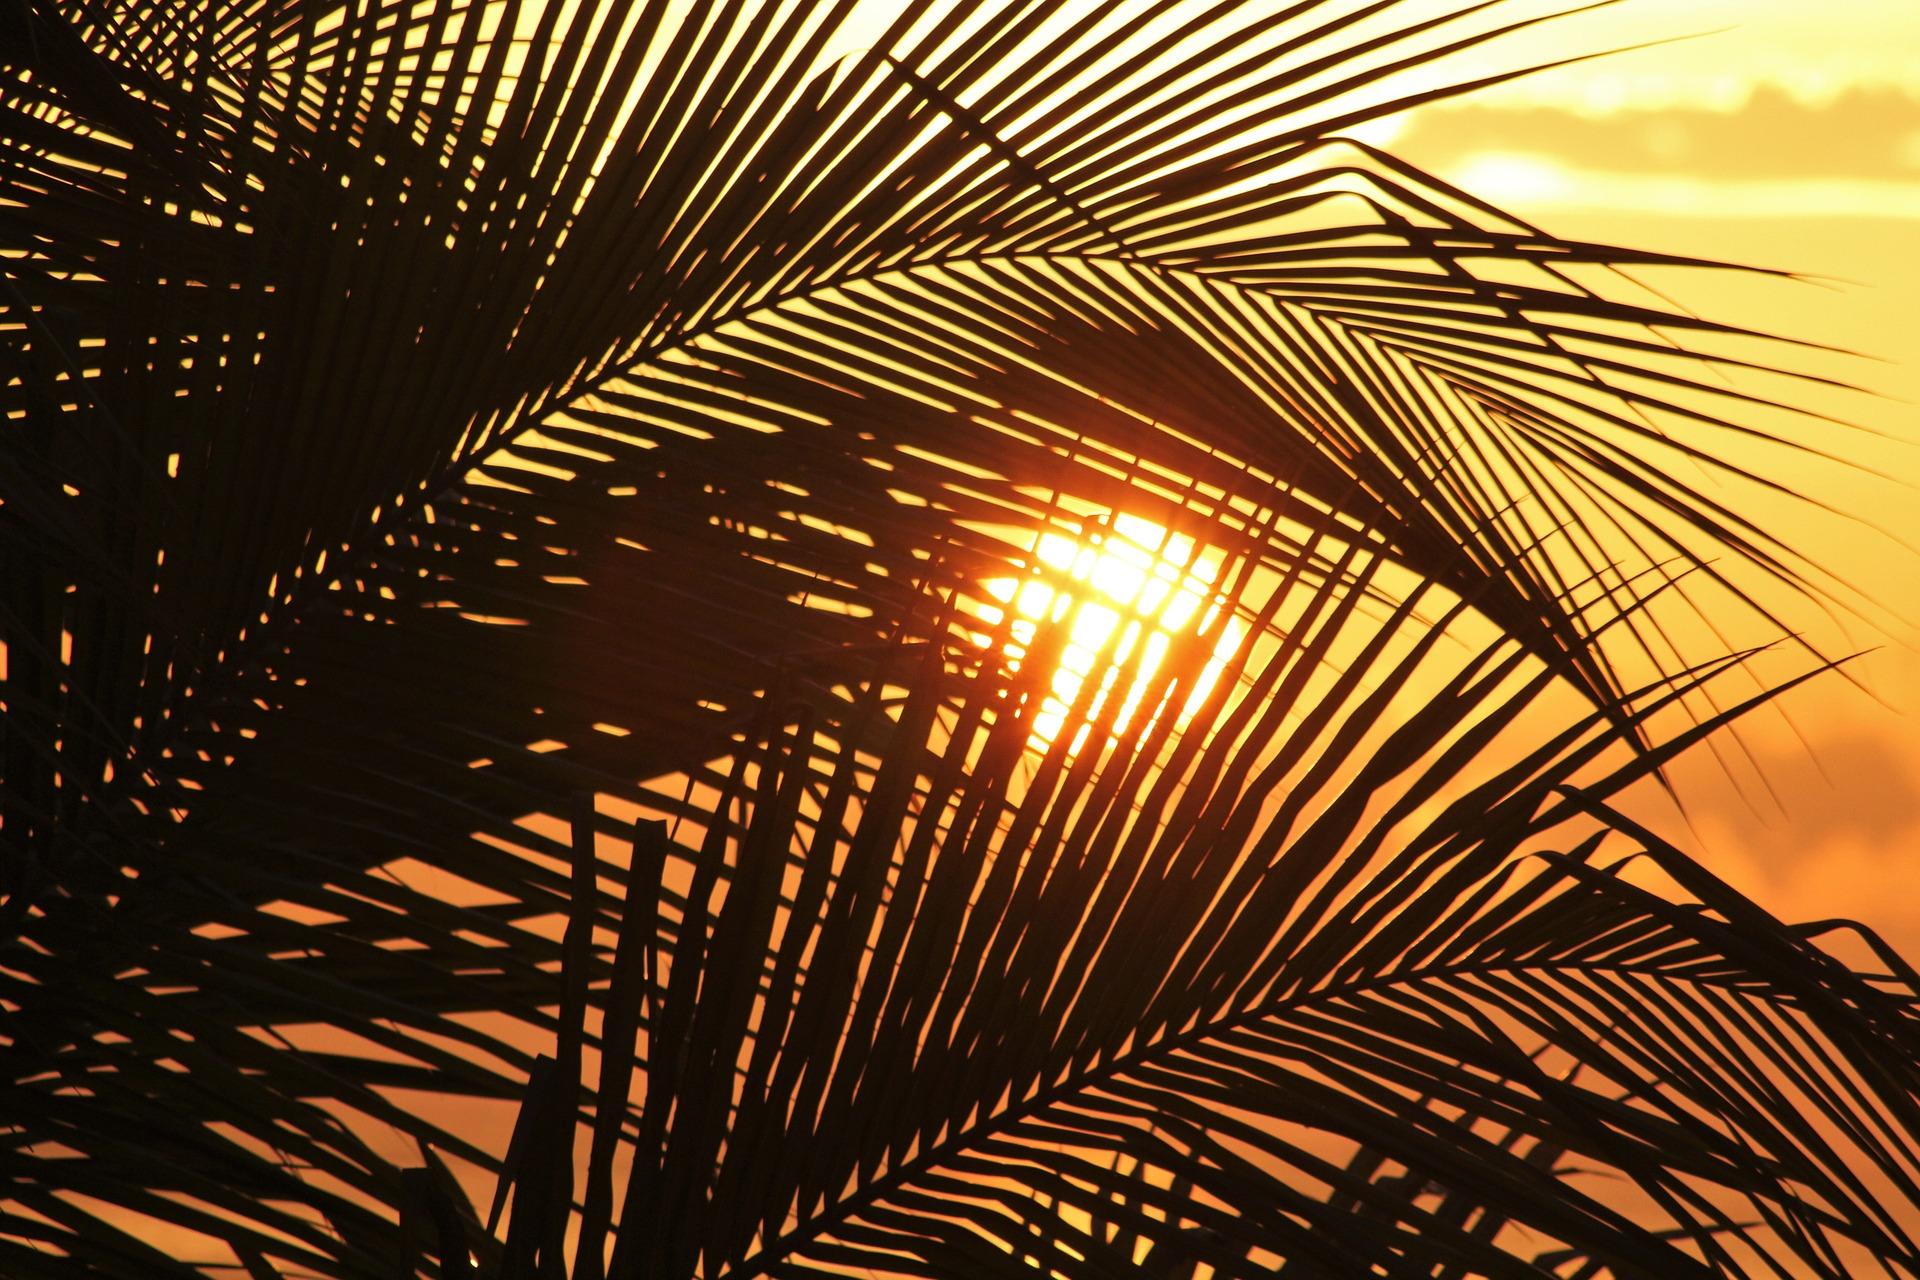 sun-of-jamaica-1111756_1920